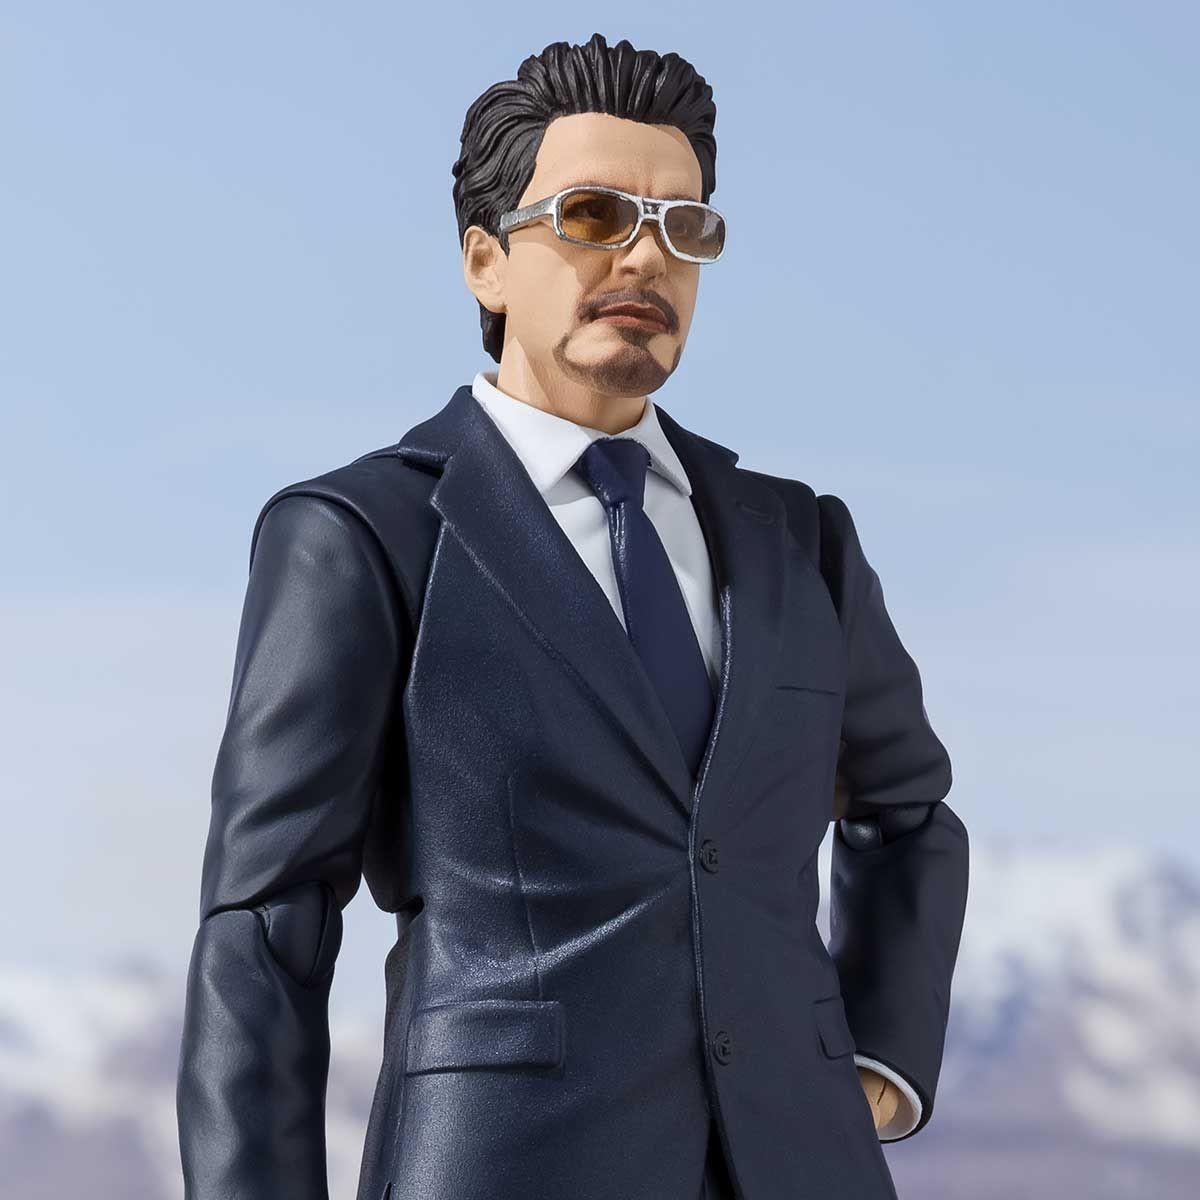 Link a Tony_Stark_Iron_Man_Birth_SH_figuarts_Bandai_Action_figure-1